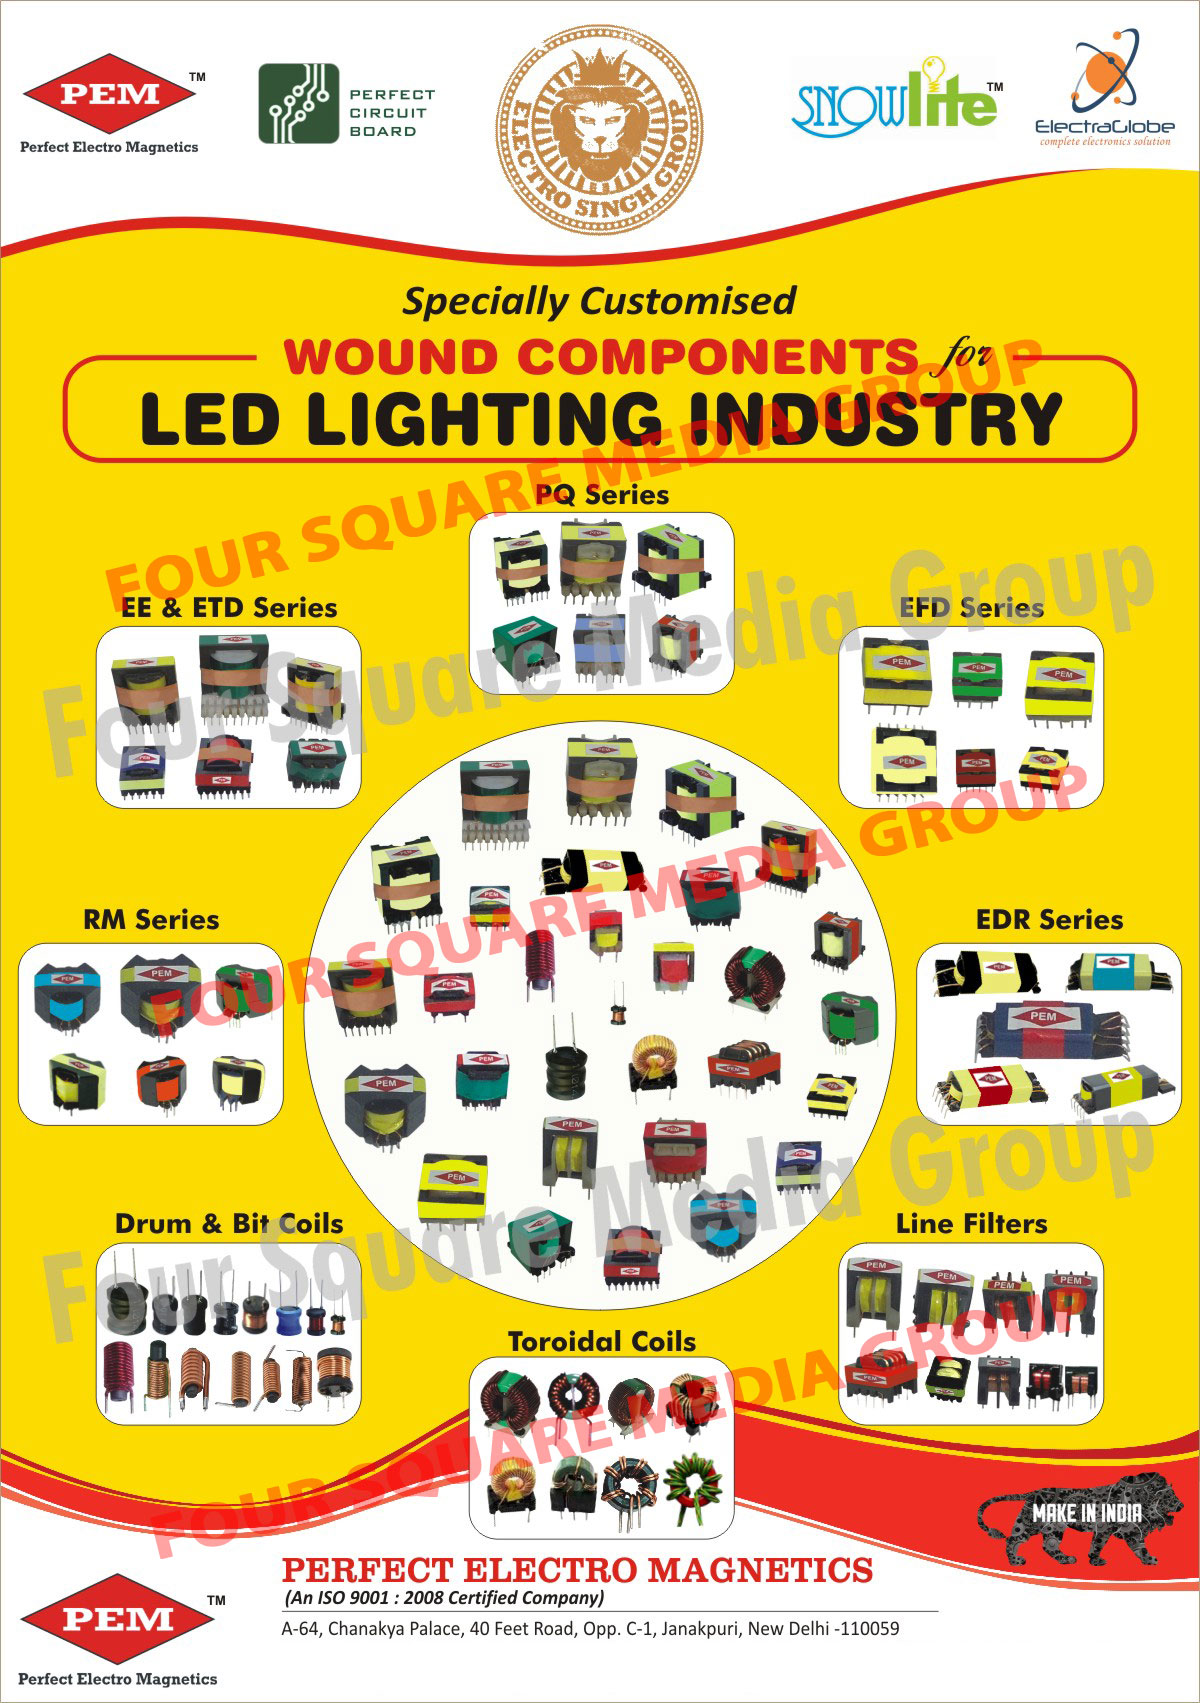 Led Light Industry Wound Components, Drum Coils, Bit Coils, Toroidal Coils Line Filters